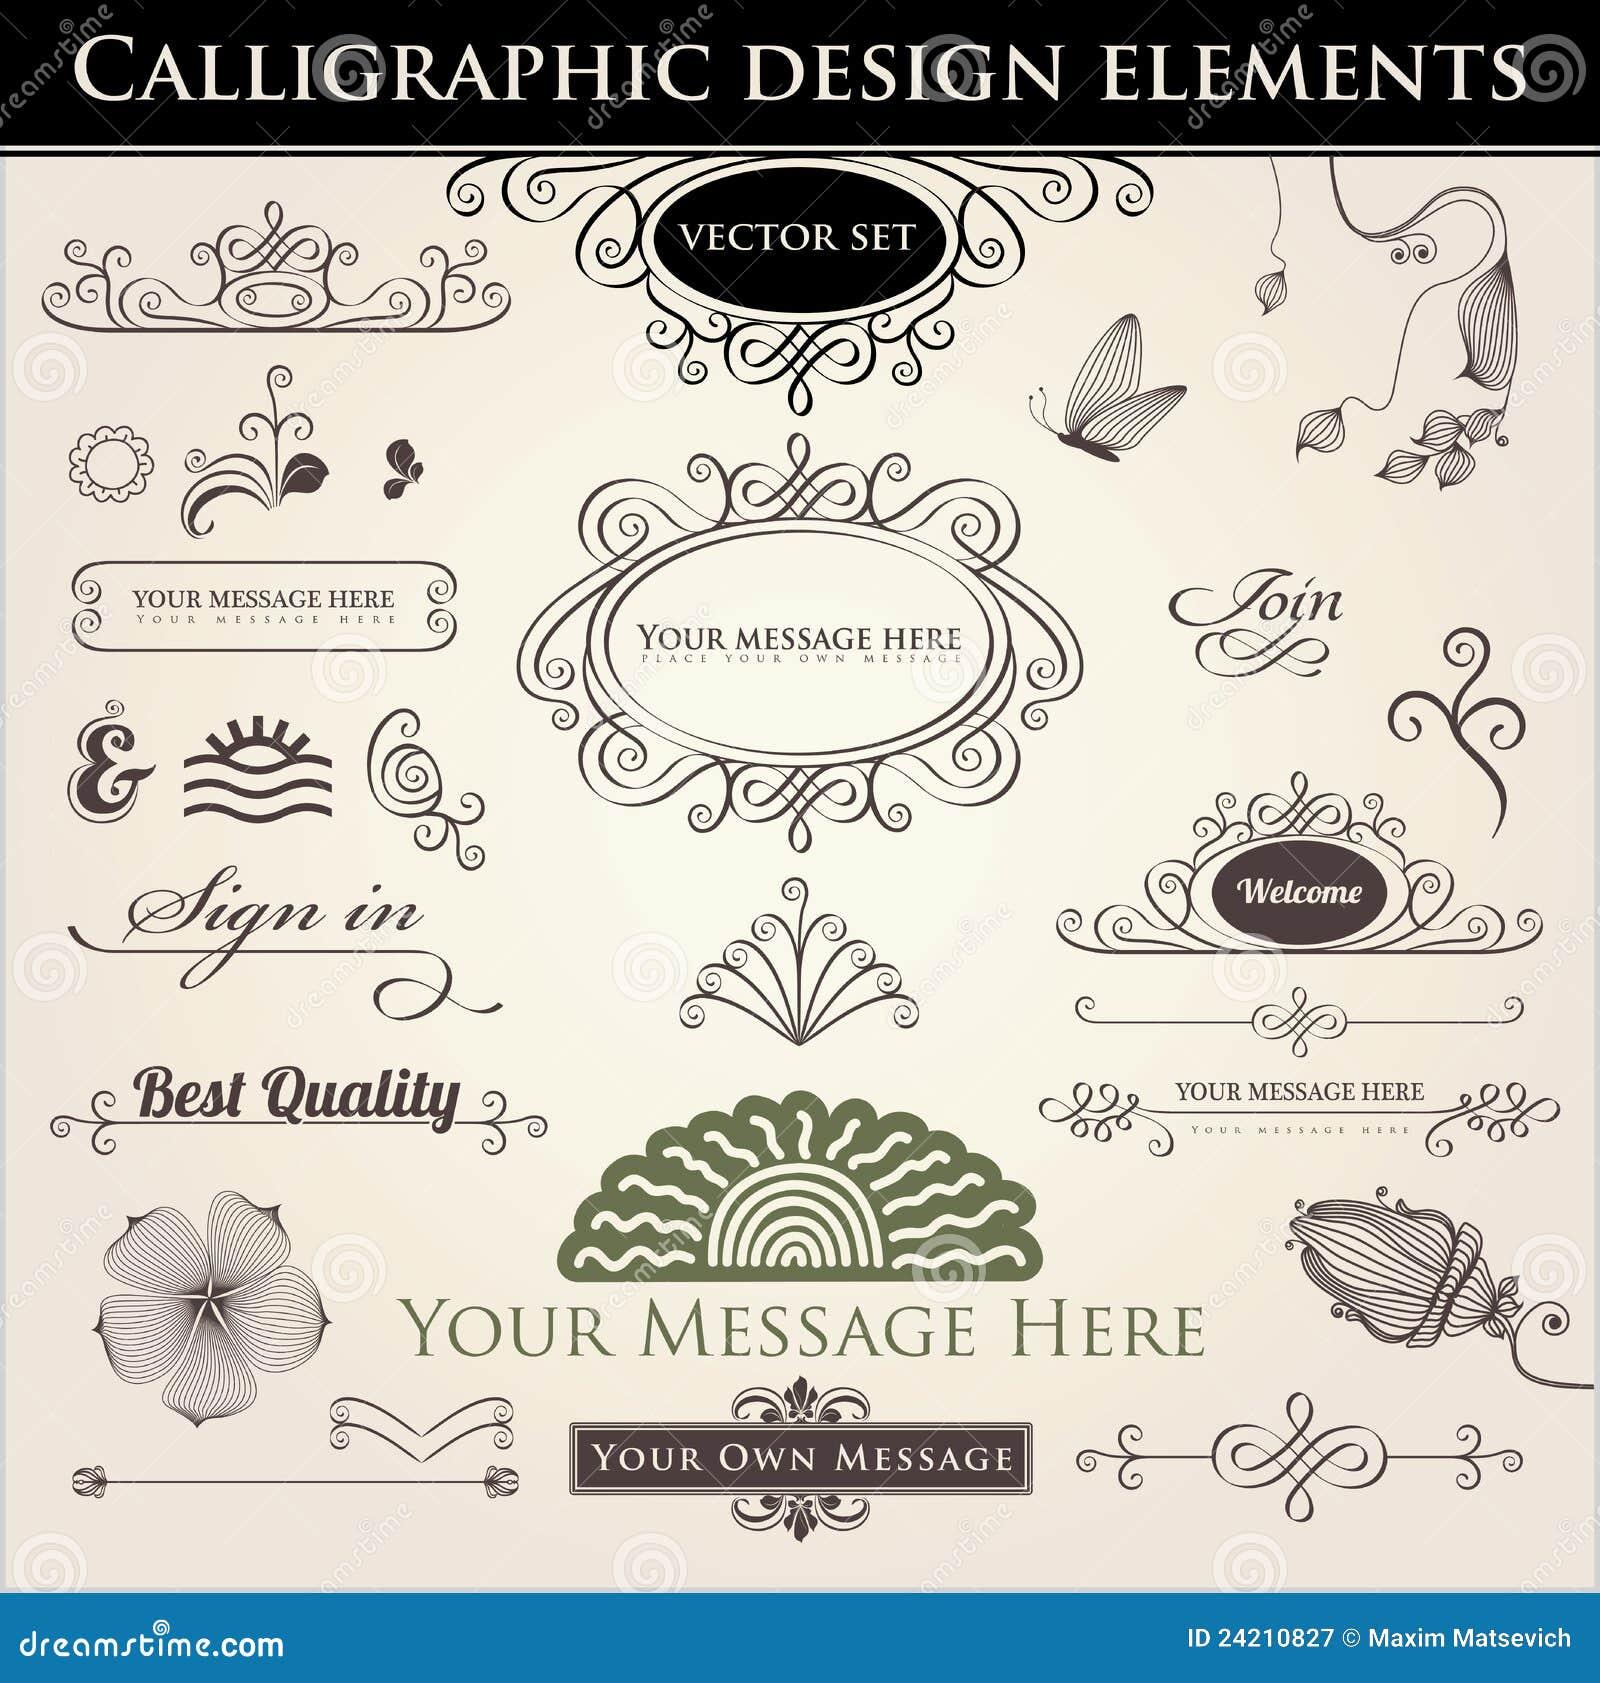 Calligraphic design elements royalty free stock